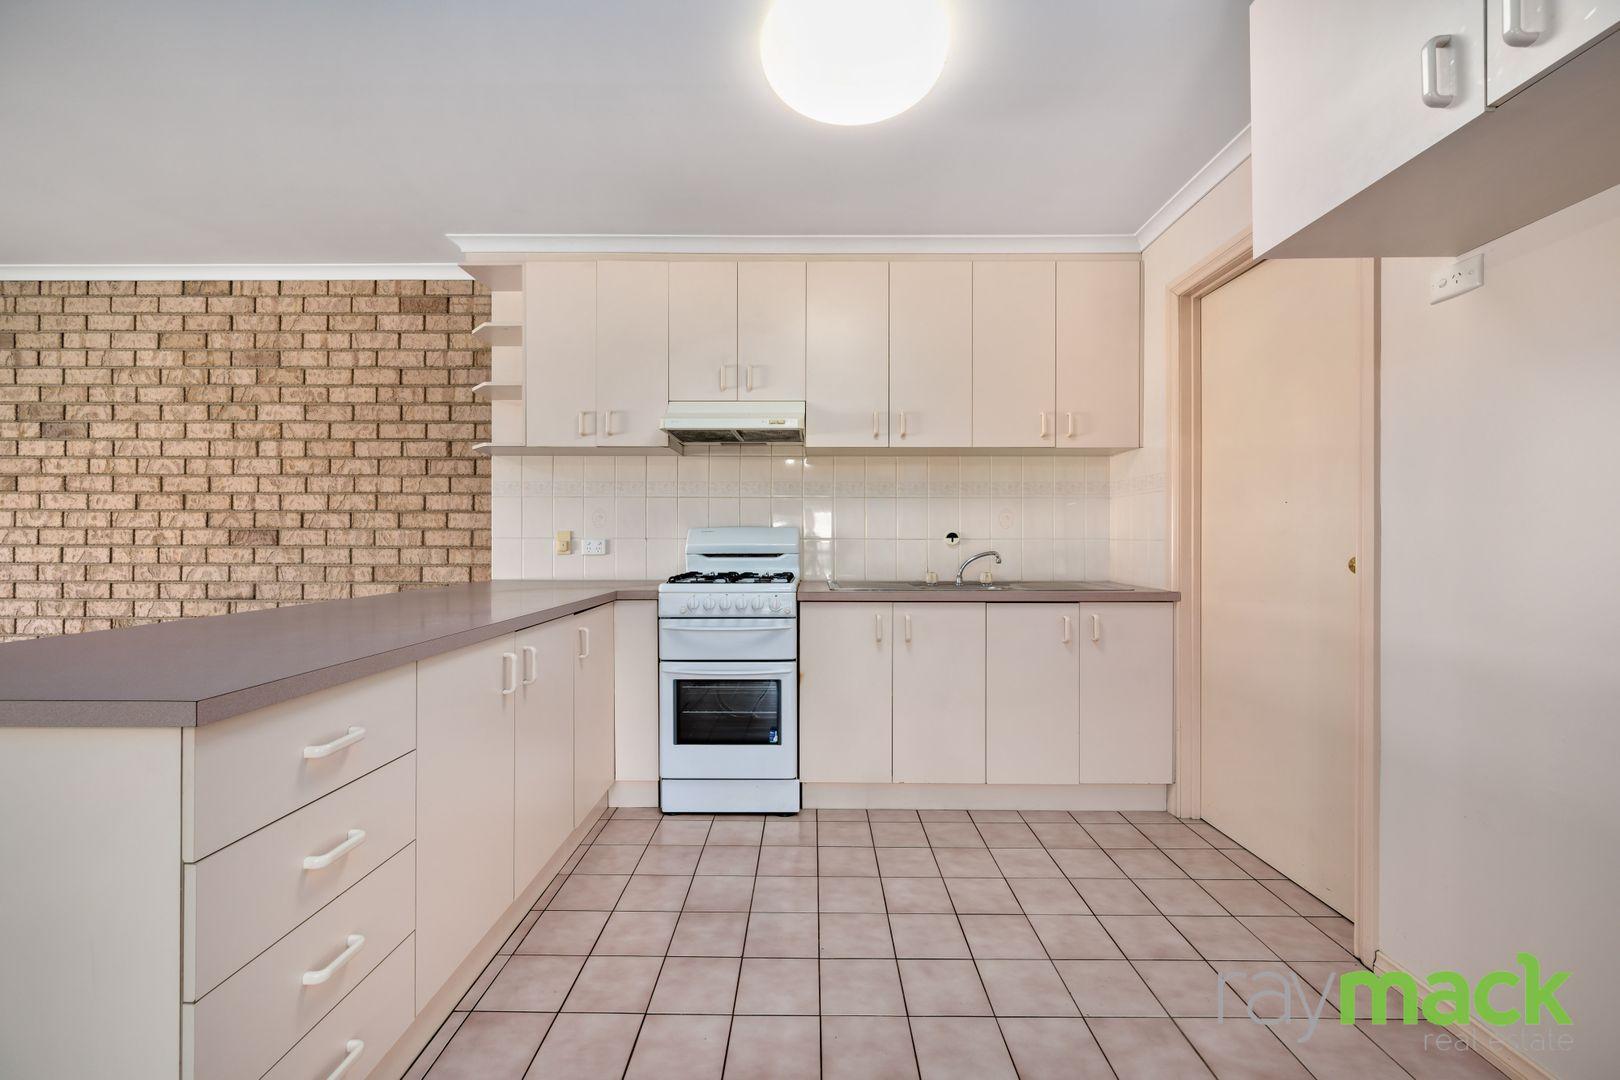 1/729 Lavis Street, East Albury NSW 2640, Image 1